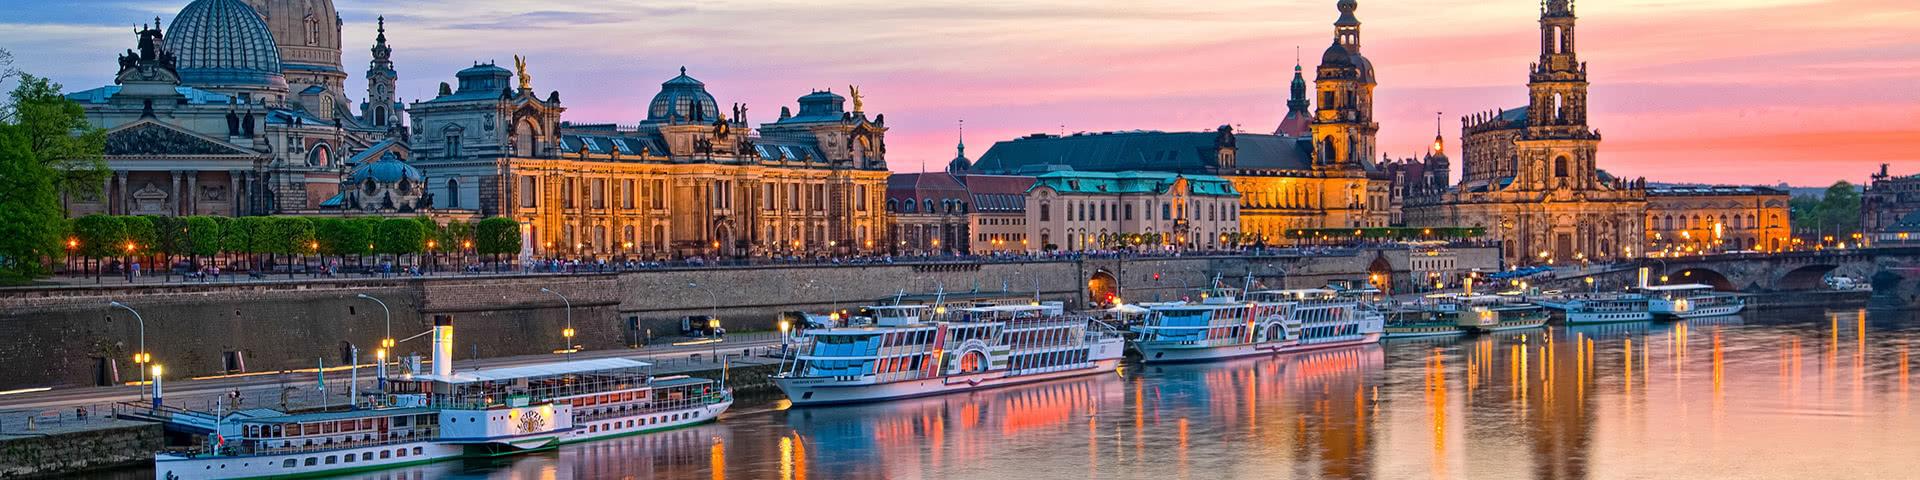 Elbflorenz in Dresden bei Sonnenuntergang